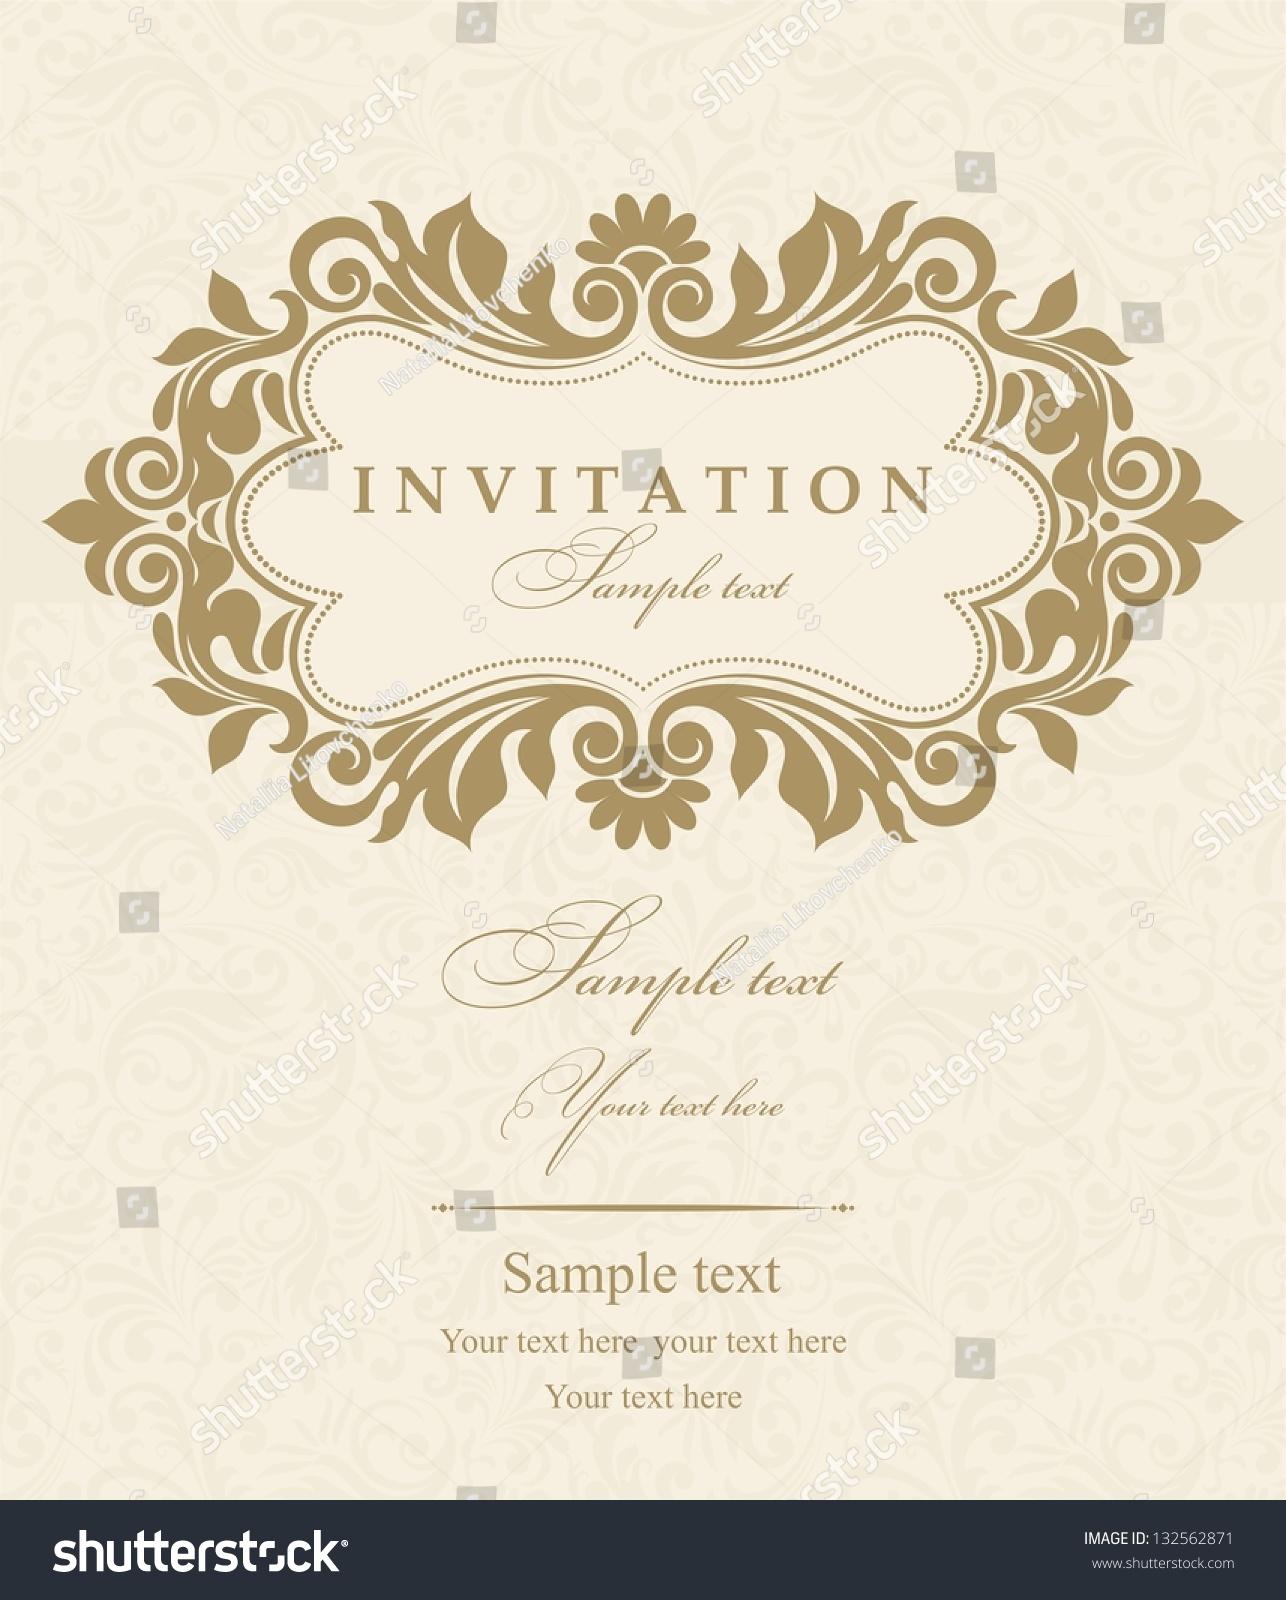 Walgreen Invitations is beautiful invitation example